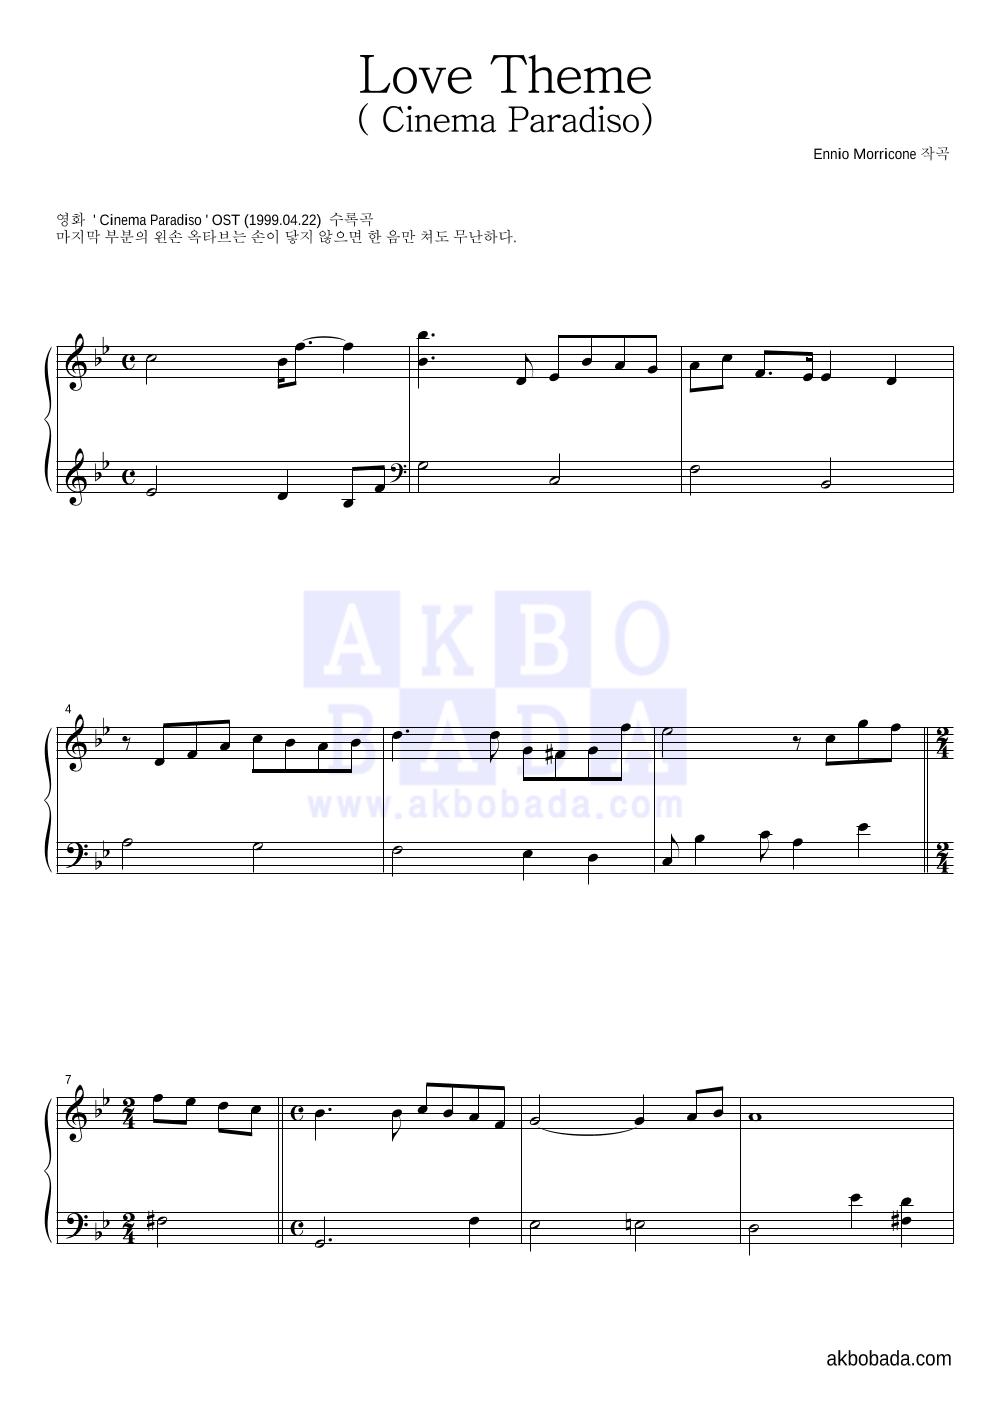 Ennio Morricone - Love Theme (Cinema Paradiso) 피아노 2단 악보